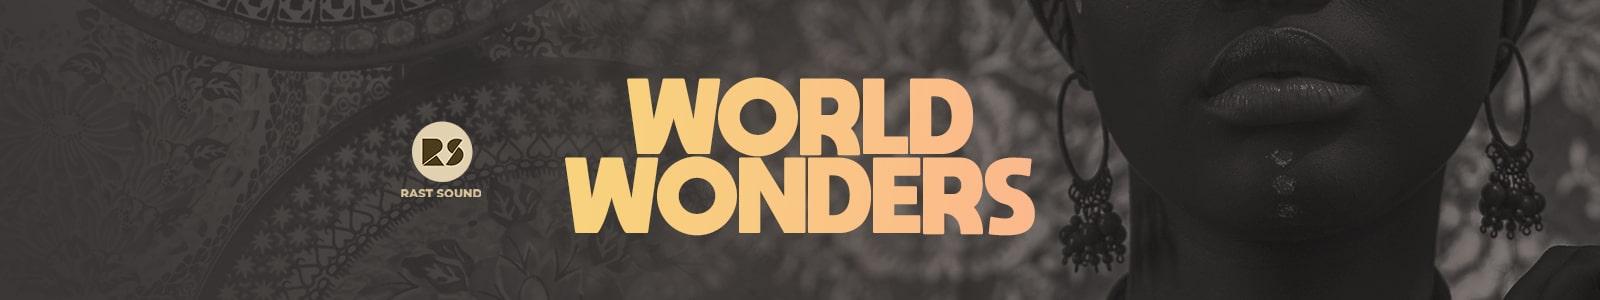 rast sound world wonders collection